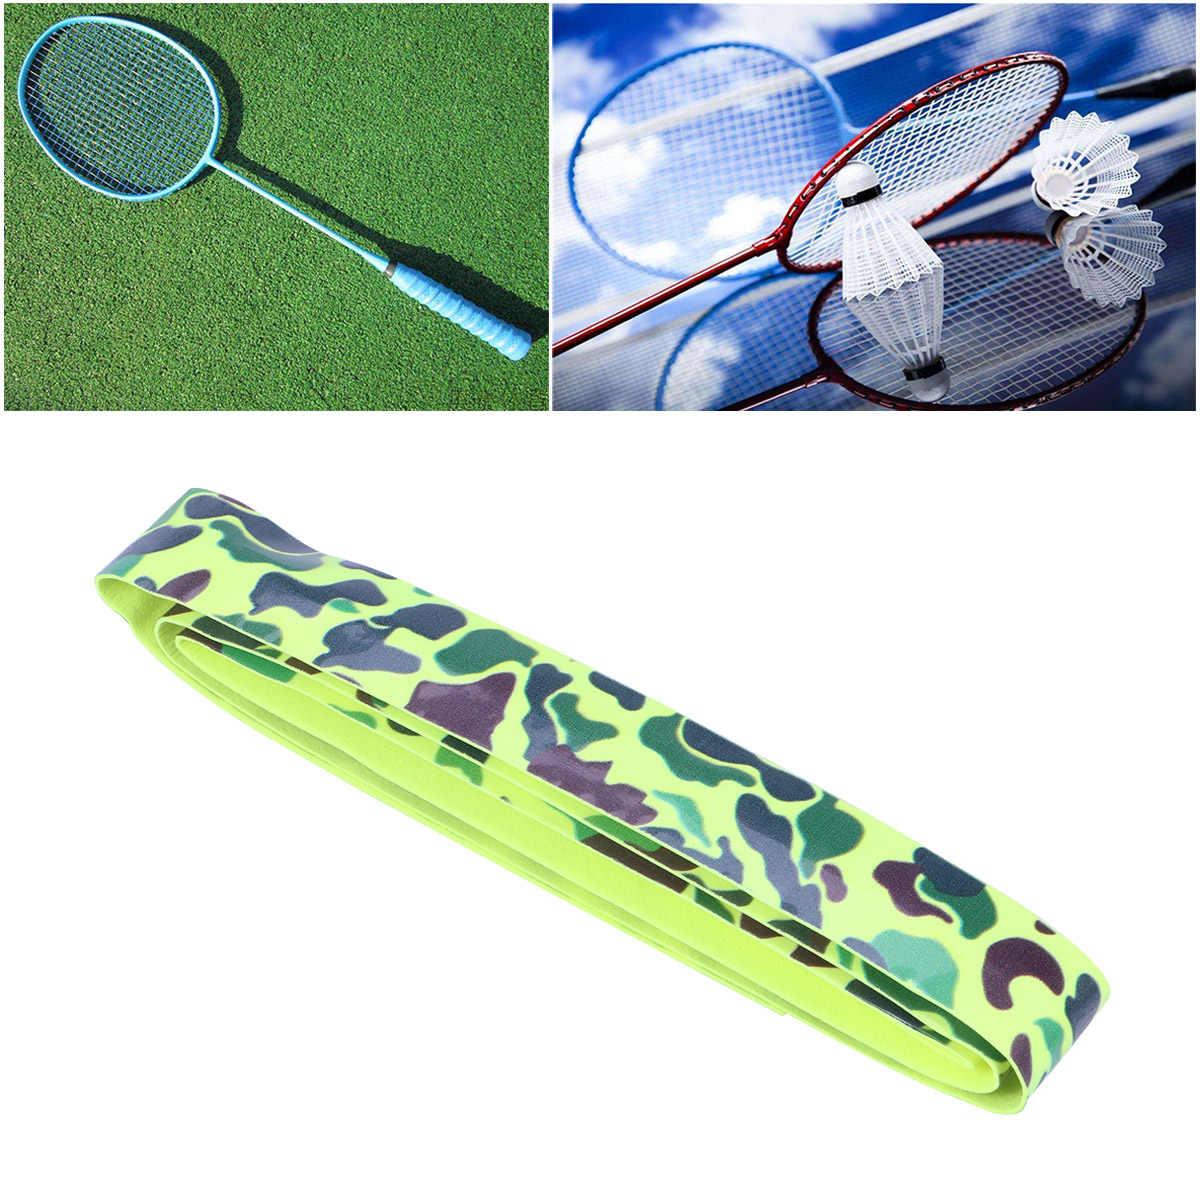 Details about  /Sports Anti Slip Sweat Tape Tennis Badminton Racket Squash Handle Over Grip Tape